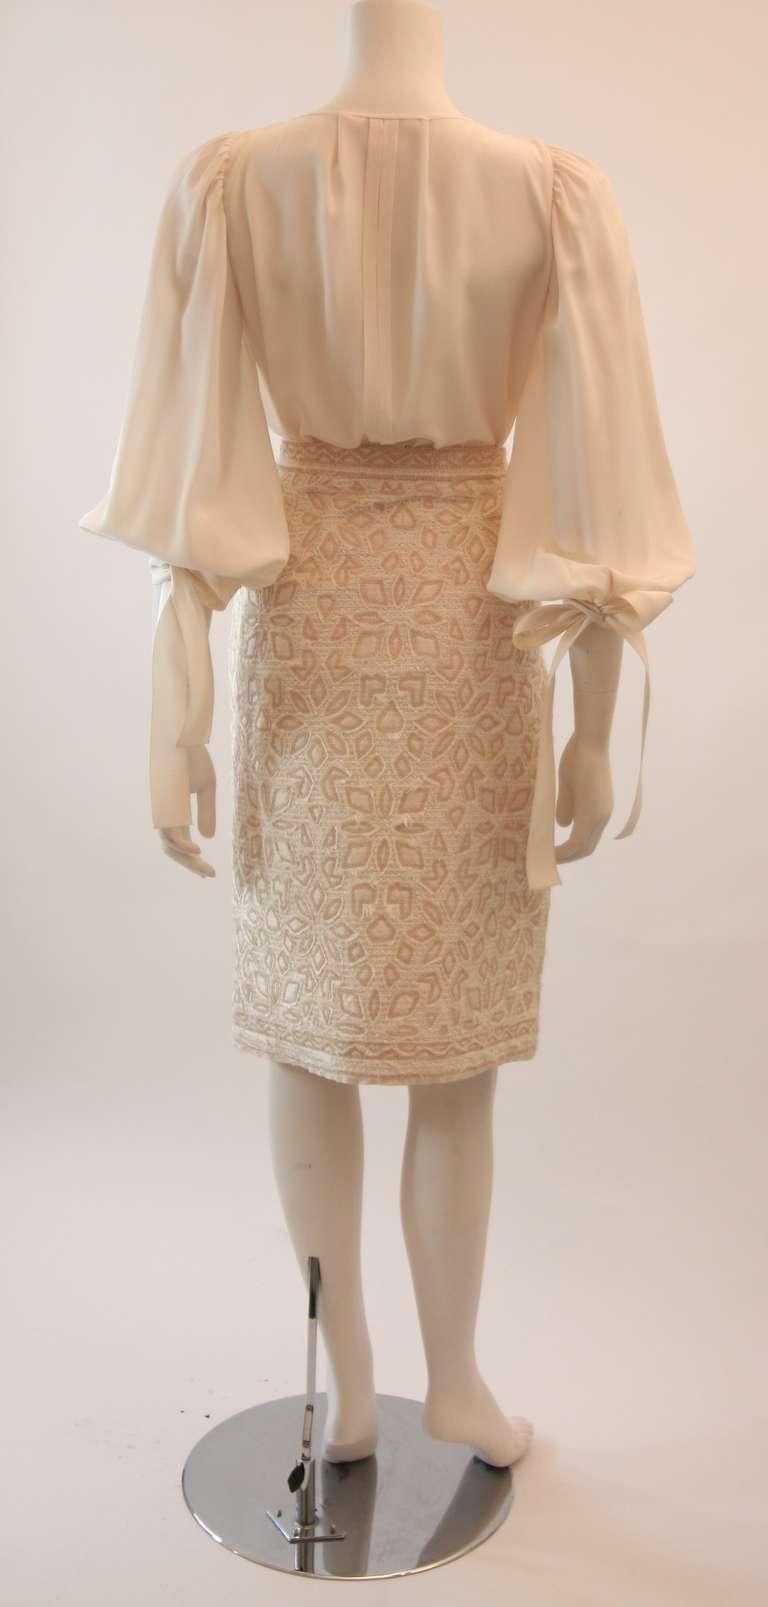 Oscar De La Renta Ivory and Cream Silk Blouse and Skirt Set Size 10 4